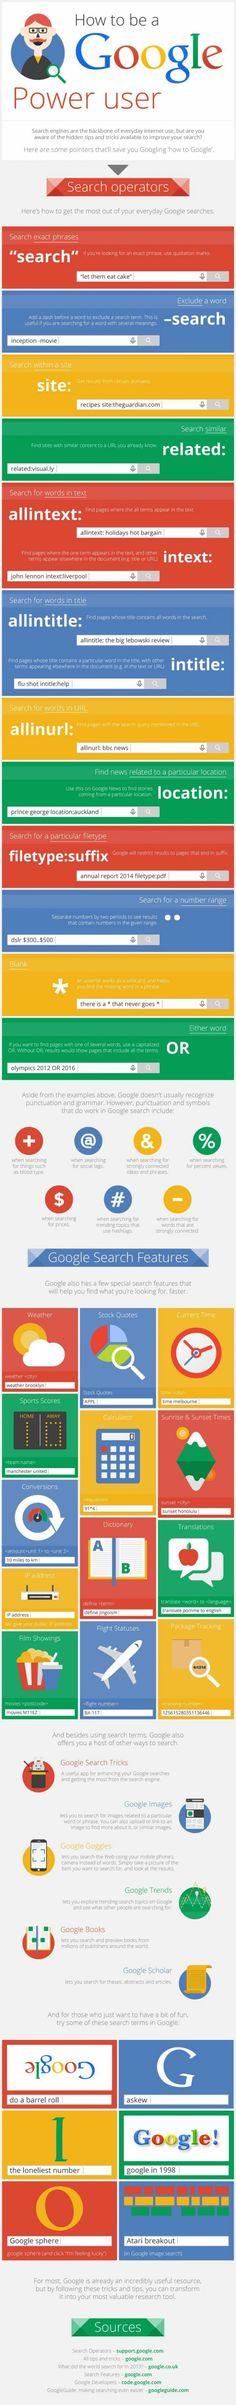 Cool Google Search Tricks